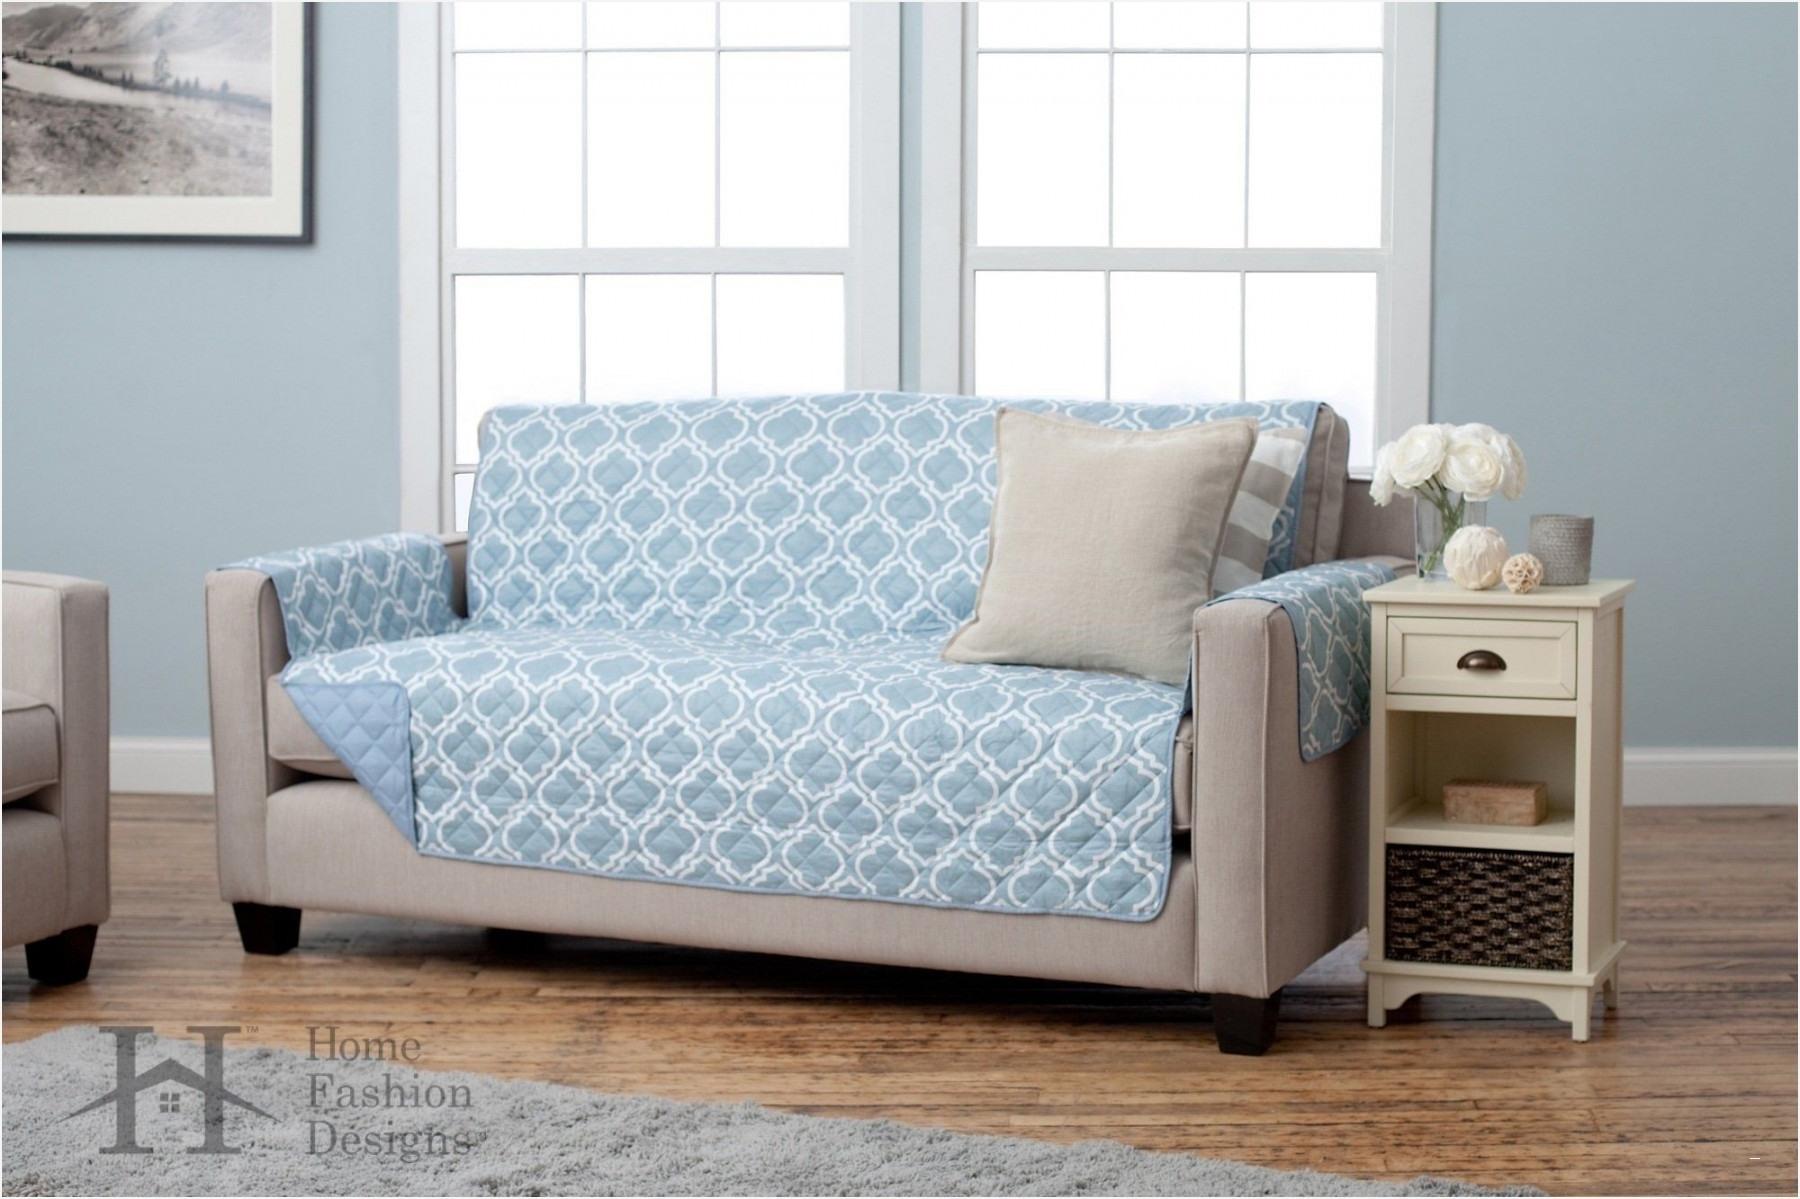 Kohl's Patio Conversation Sets Pertaining To 2018 Unique Kohls Sofa Covers Kohl S Patio Furniture Sets Inspirational (View 12 of 15)